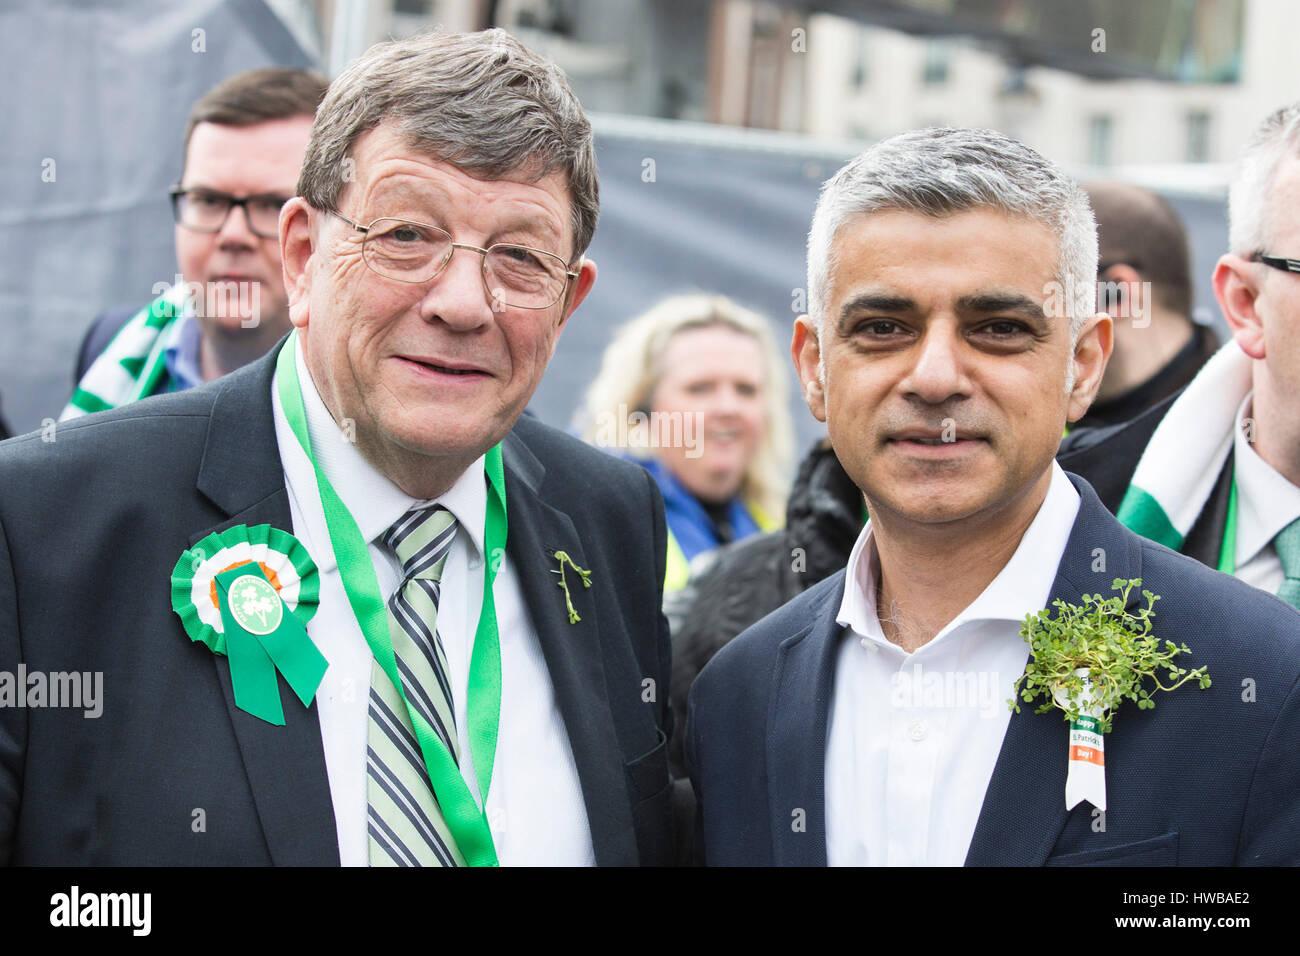 London, UK. 19 March 2017. Pat Doherty MP, Sinn Fein, with London Mayor Sadiq Khan. London celebrates St Patricks - Stock Image